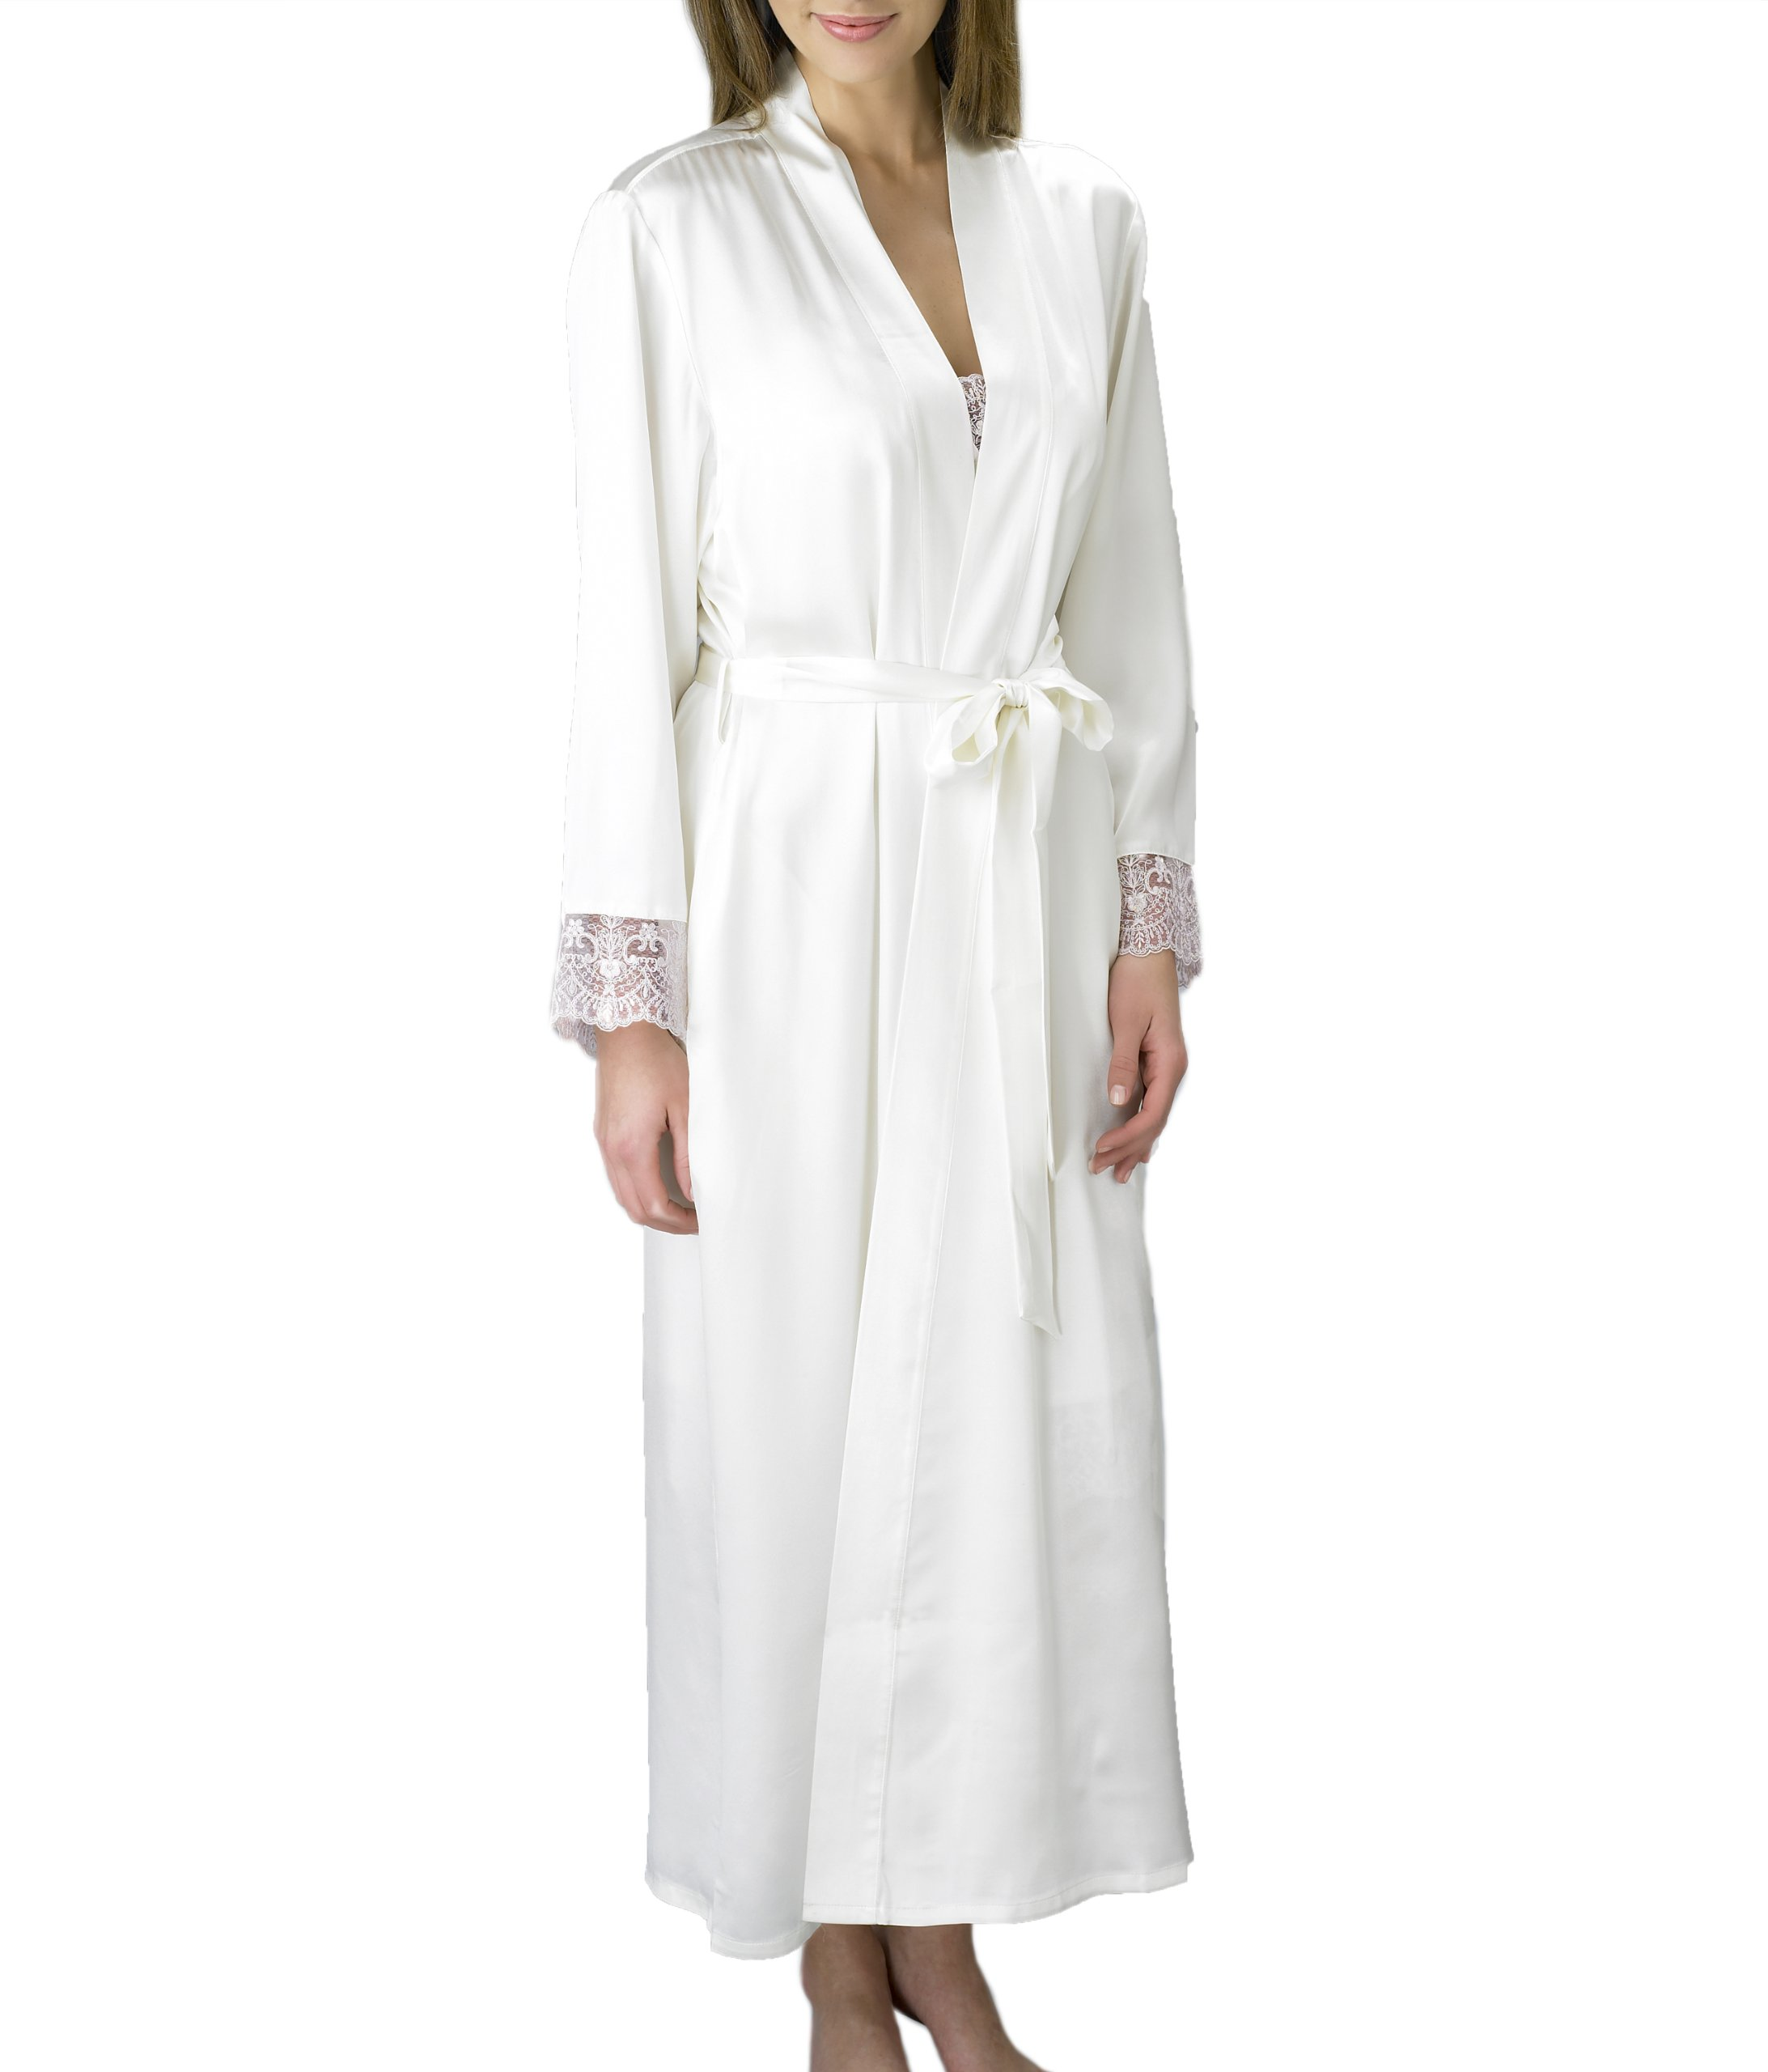 Julianna Rae Women's Silk Robe, Full Length, Lace Trim, 2 Pocket, Le Soir Dream